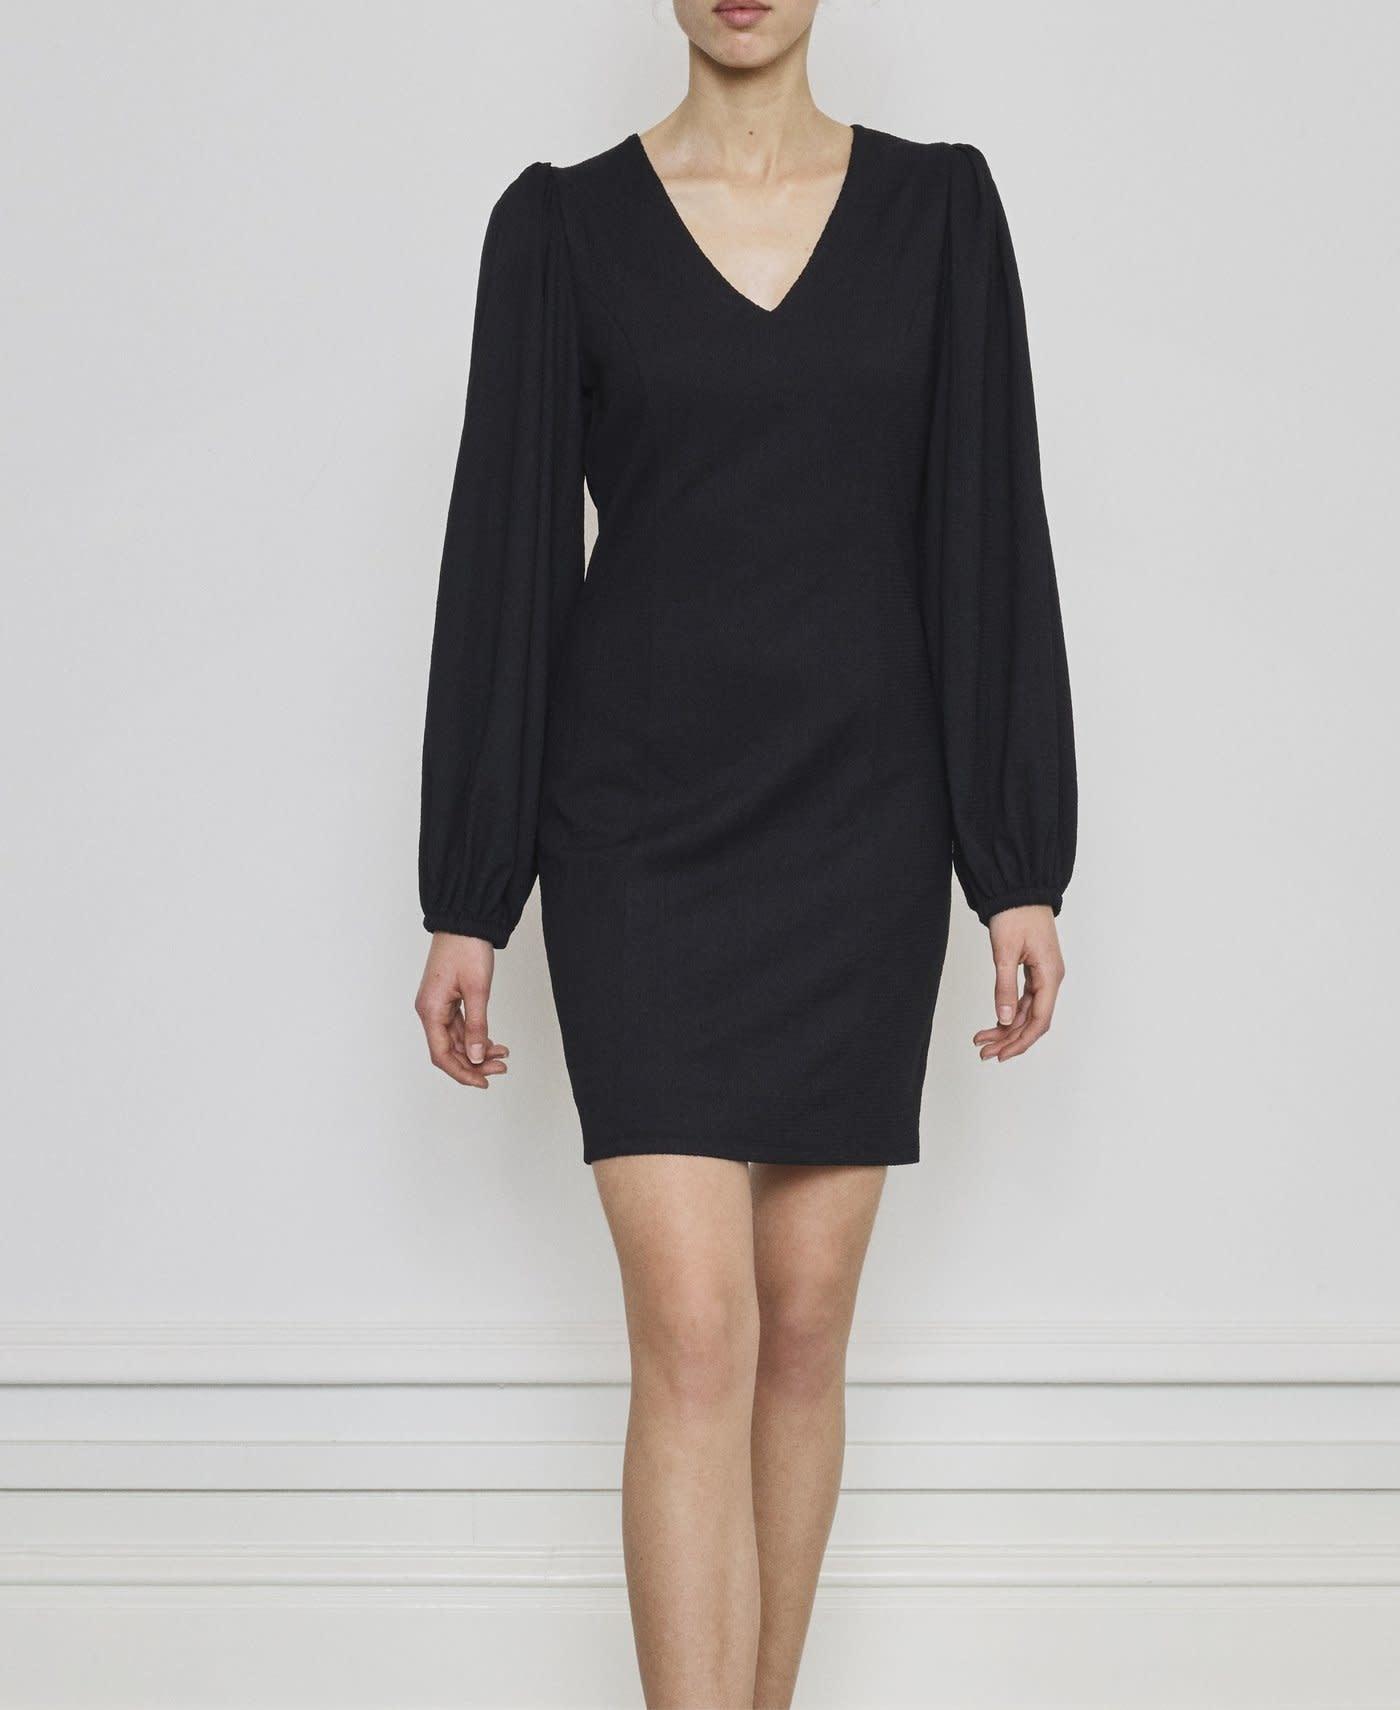 venus dress black-4